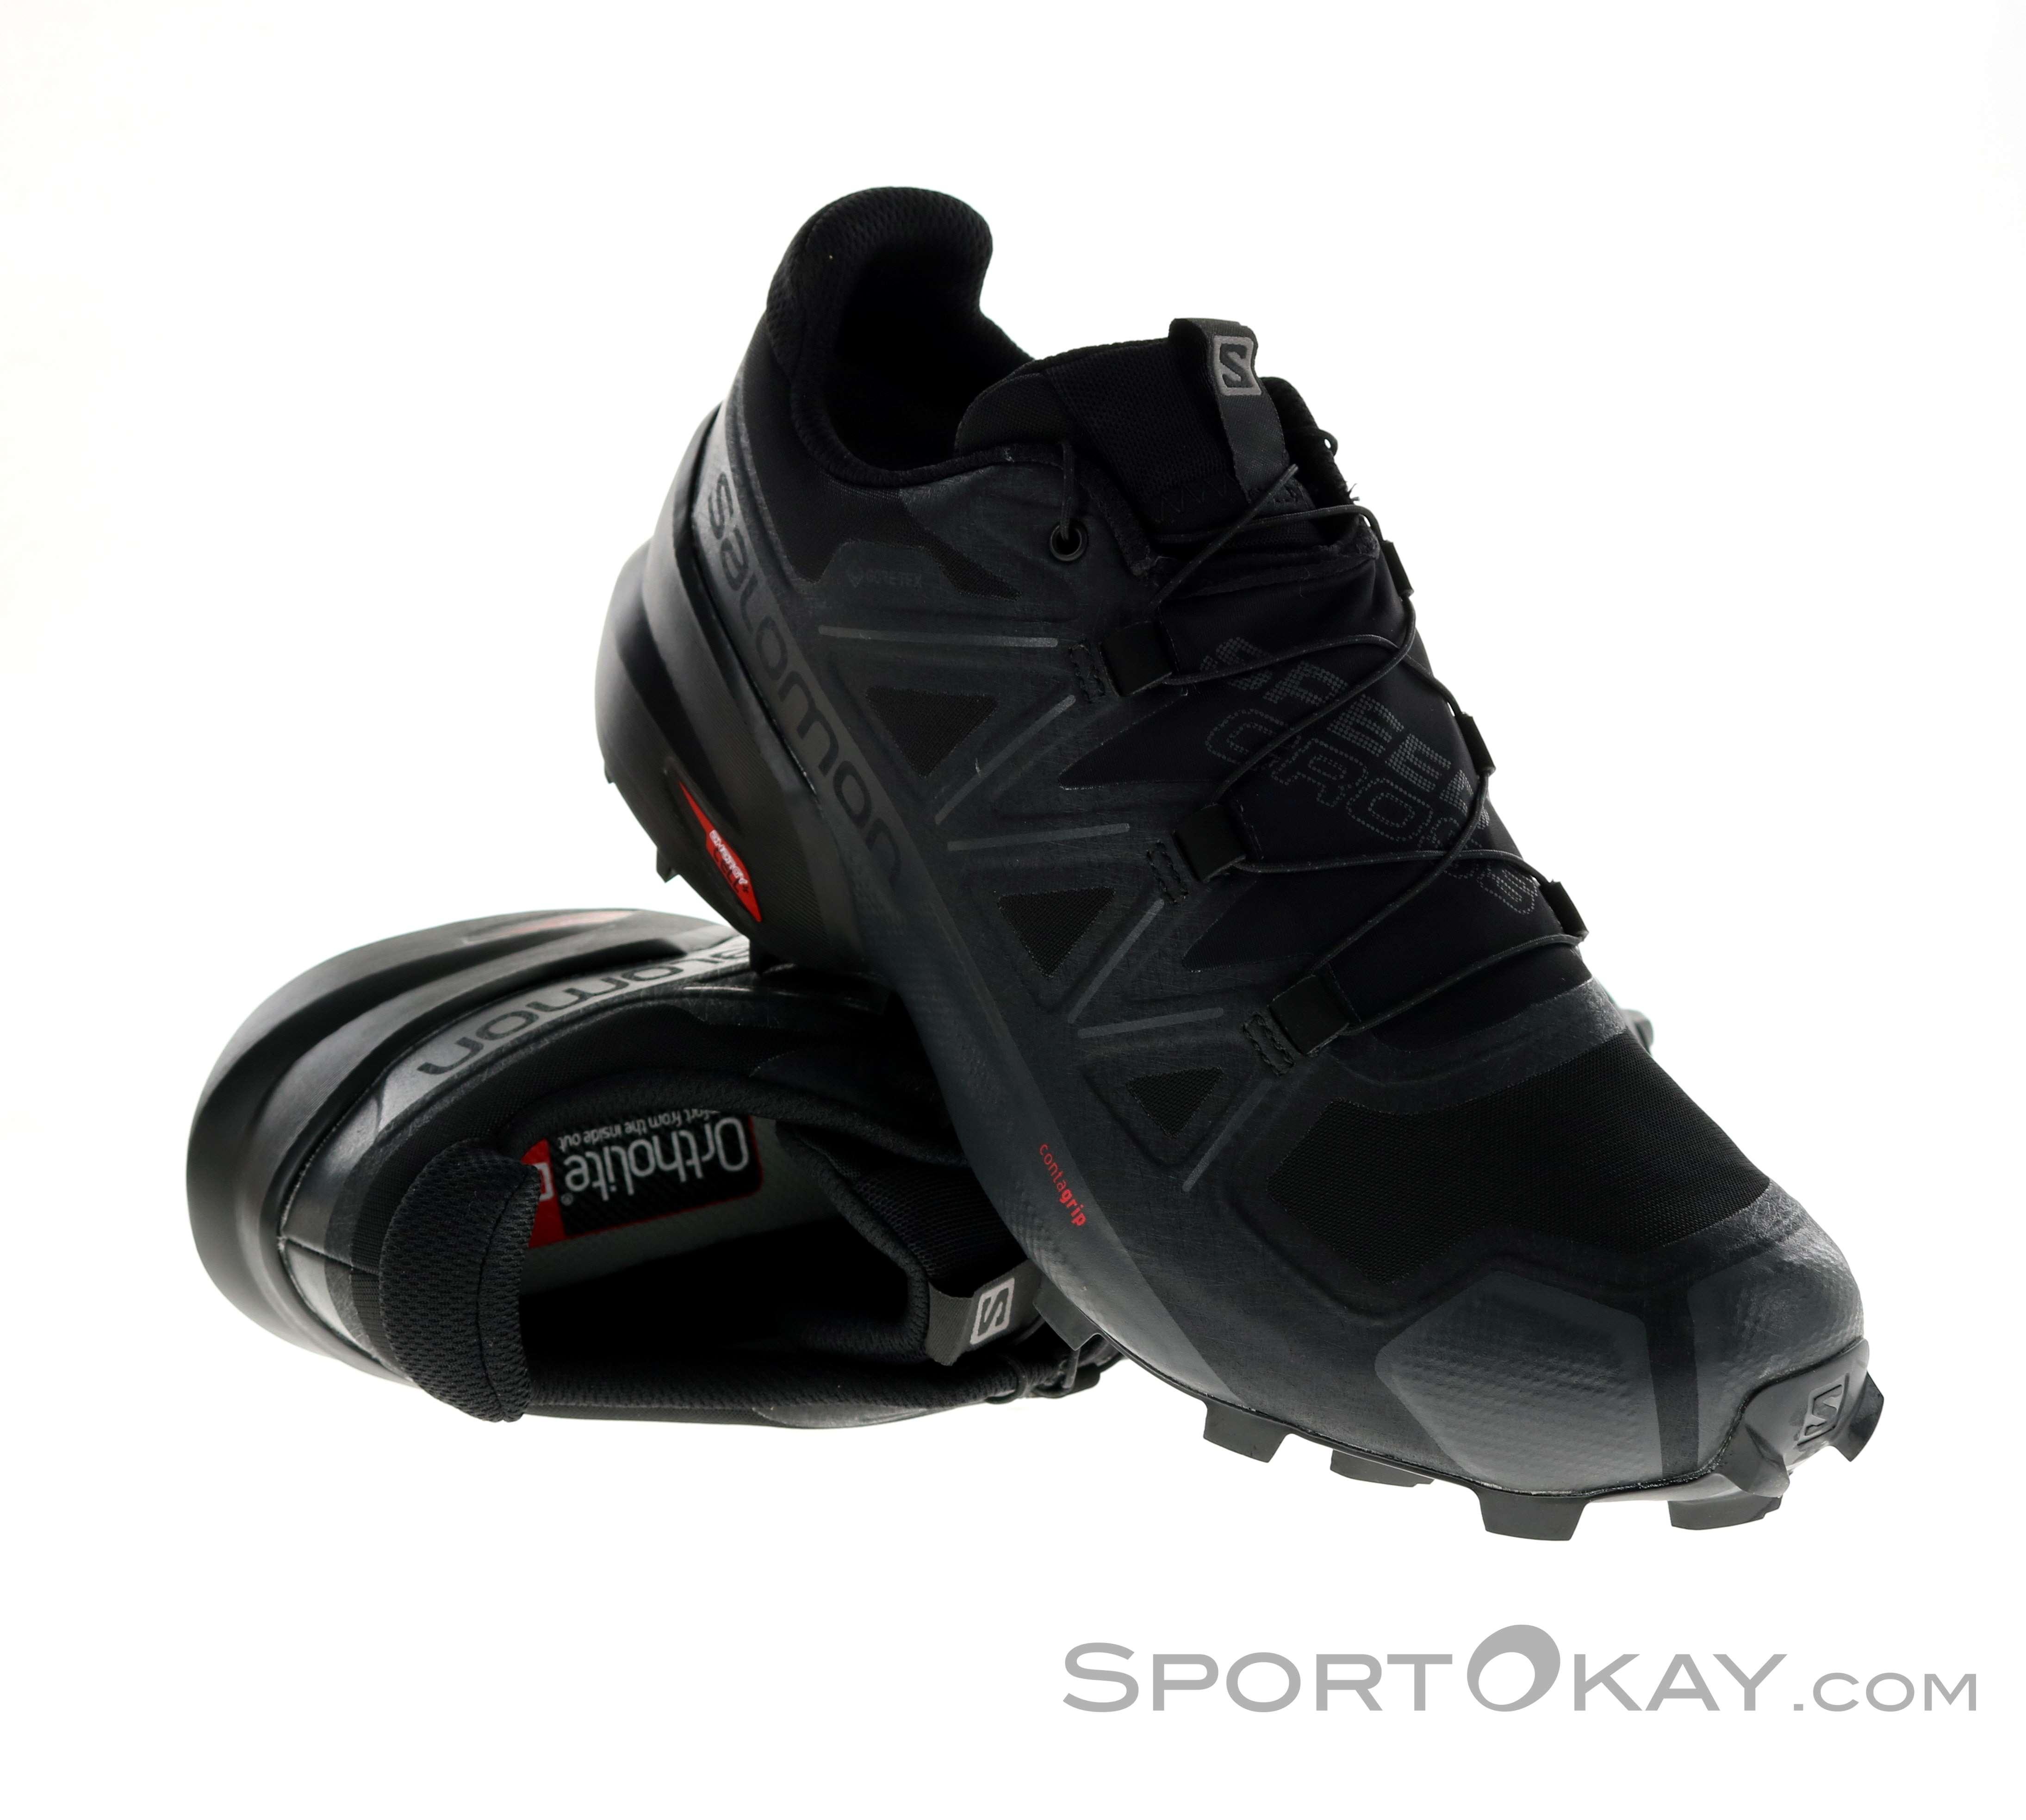 Salomon Speedcross 5 GTX Mens Trail Running Shoes Gore Tex W2DlJ